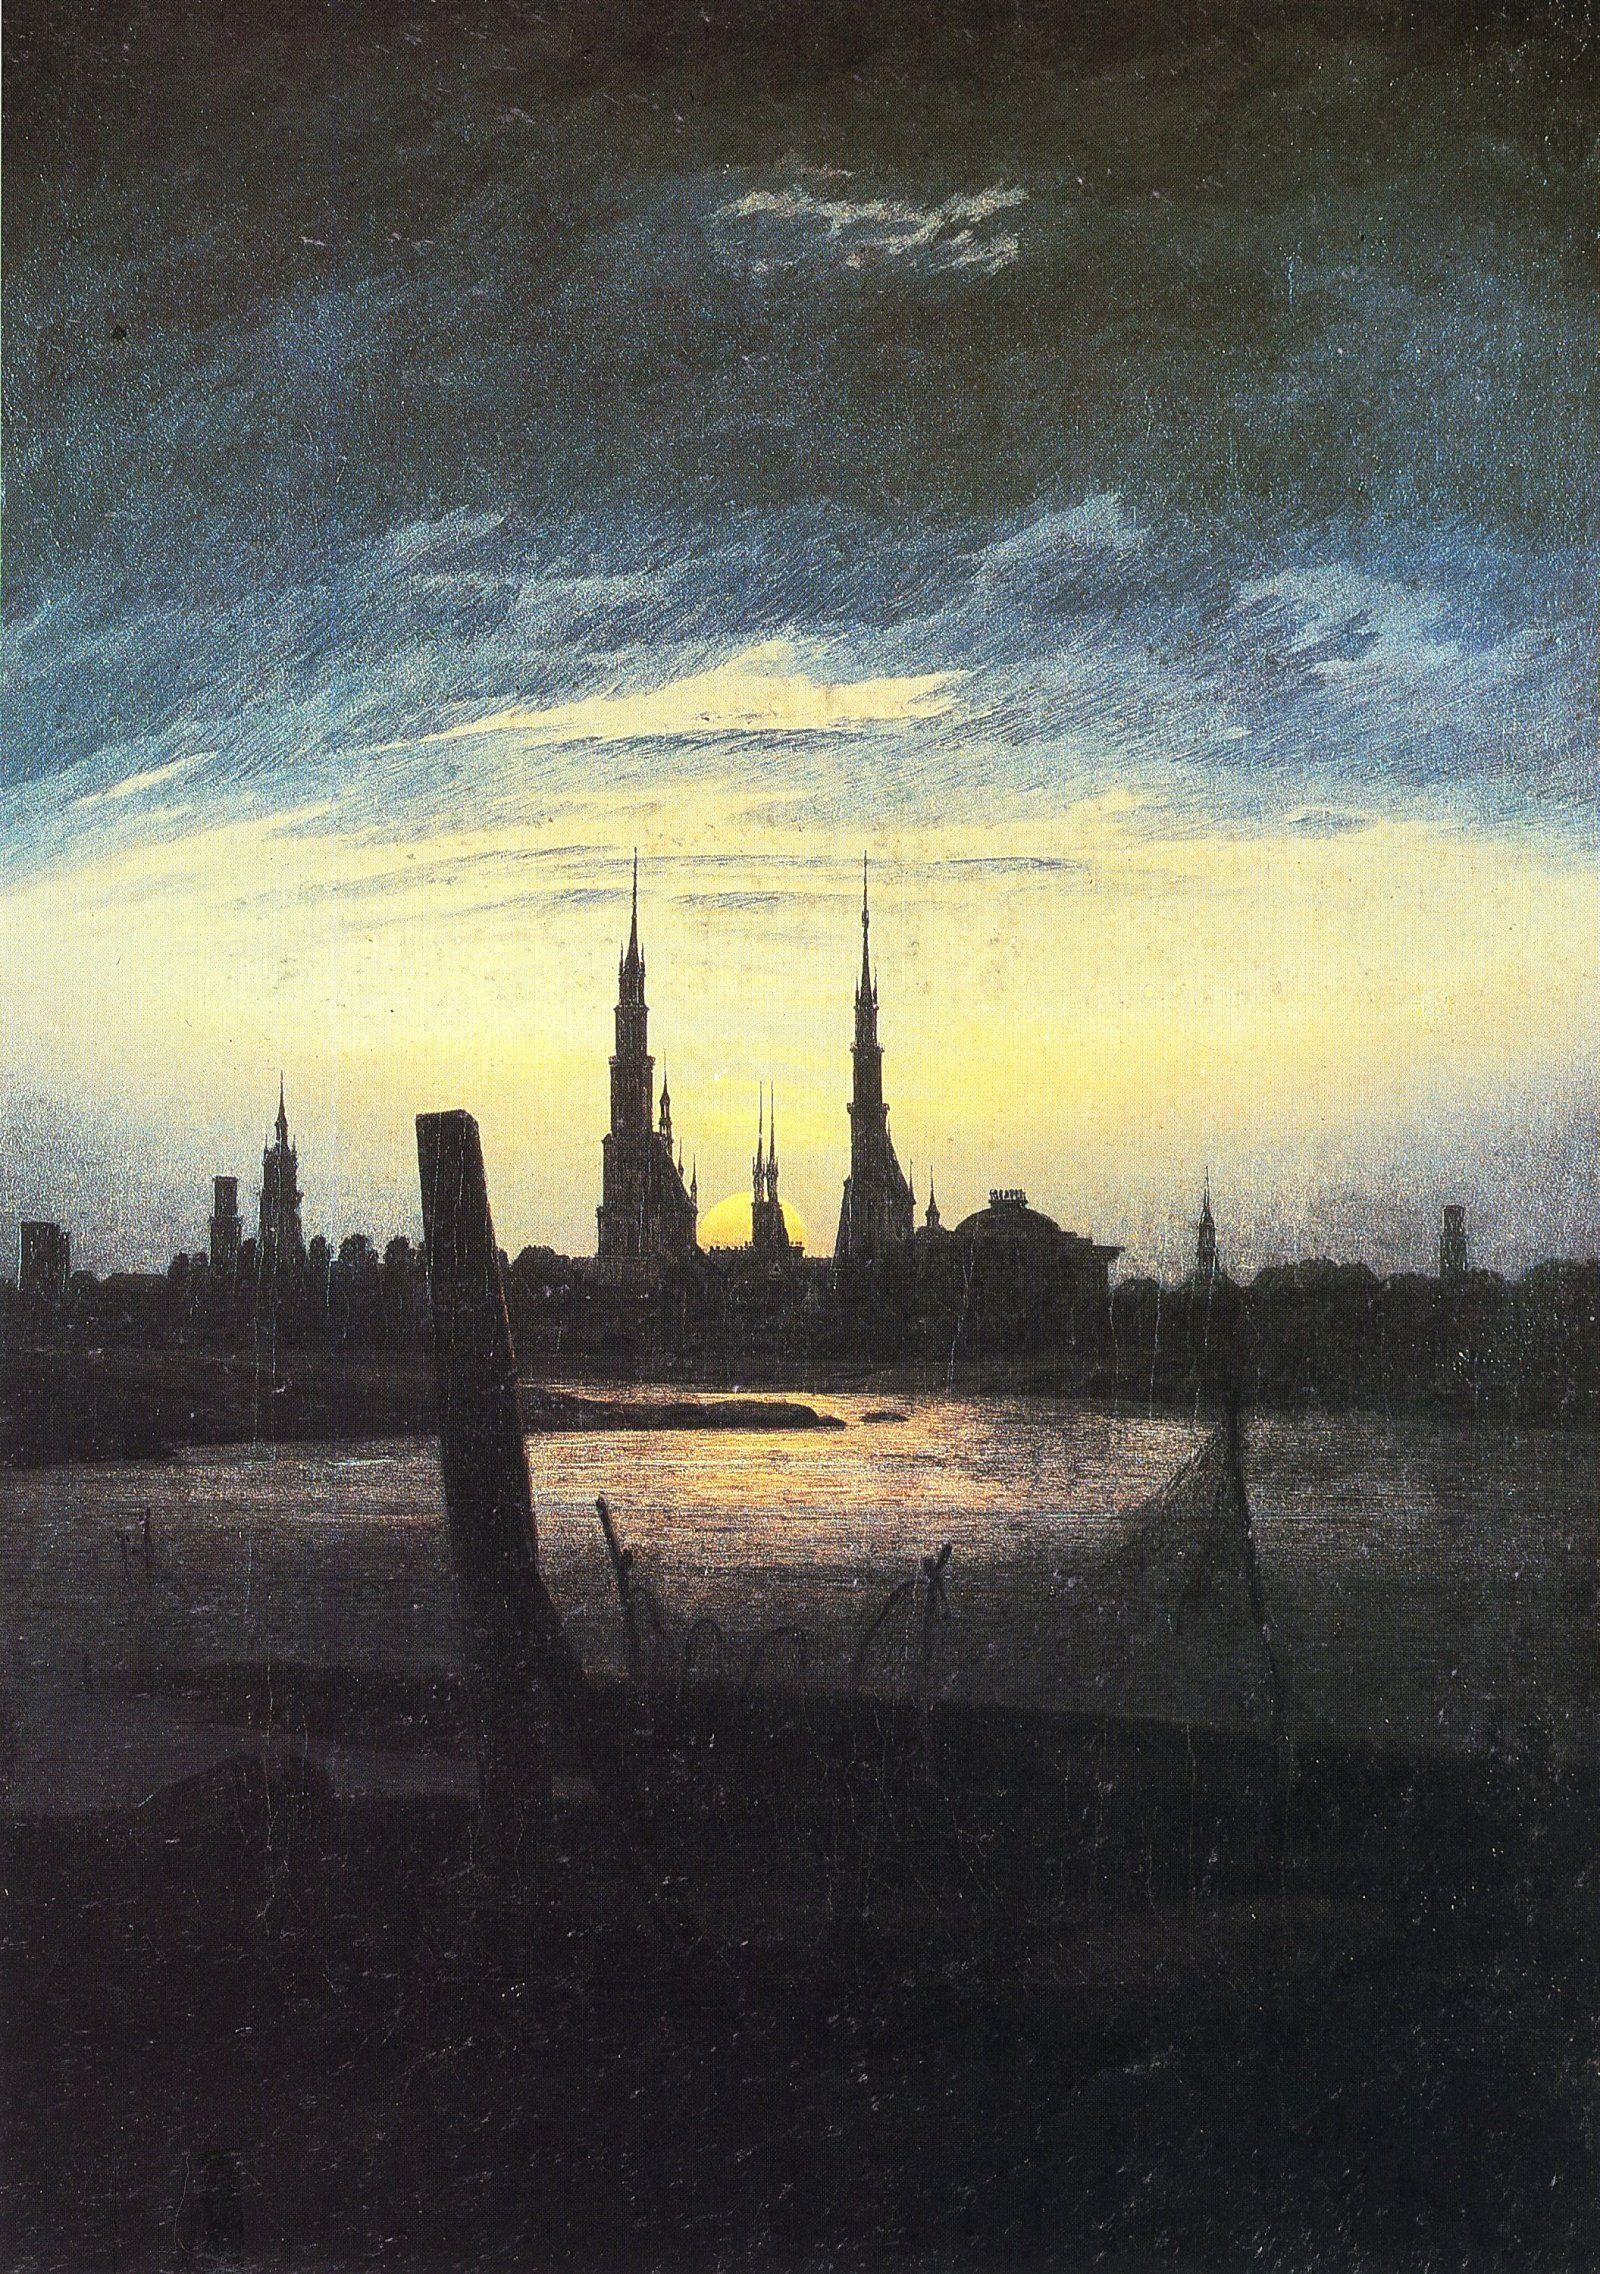 Landschaftsmalerei romantik friedrich  Caspar David Friedrich Stadt bei Mondaufgang | Caspar David ...